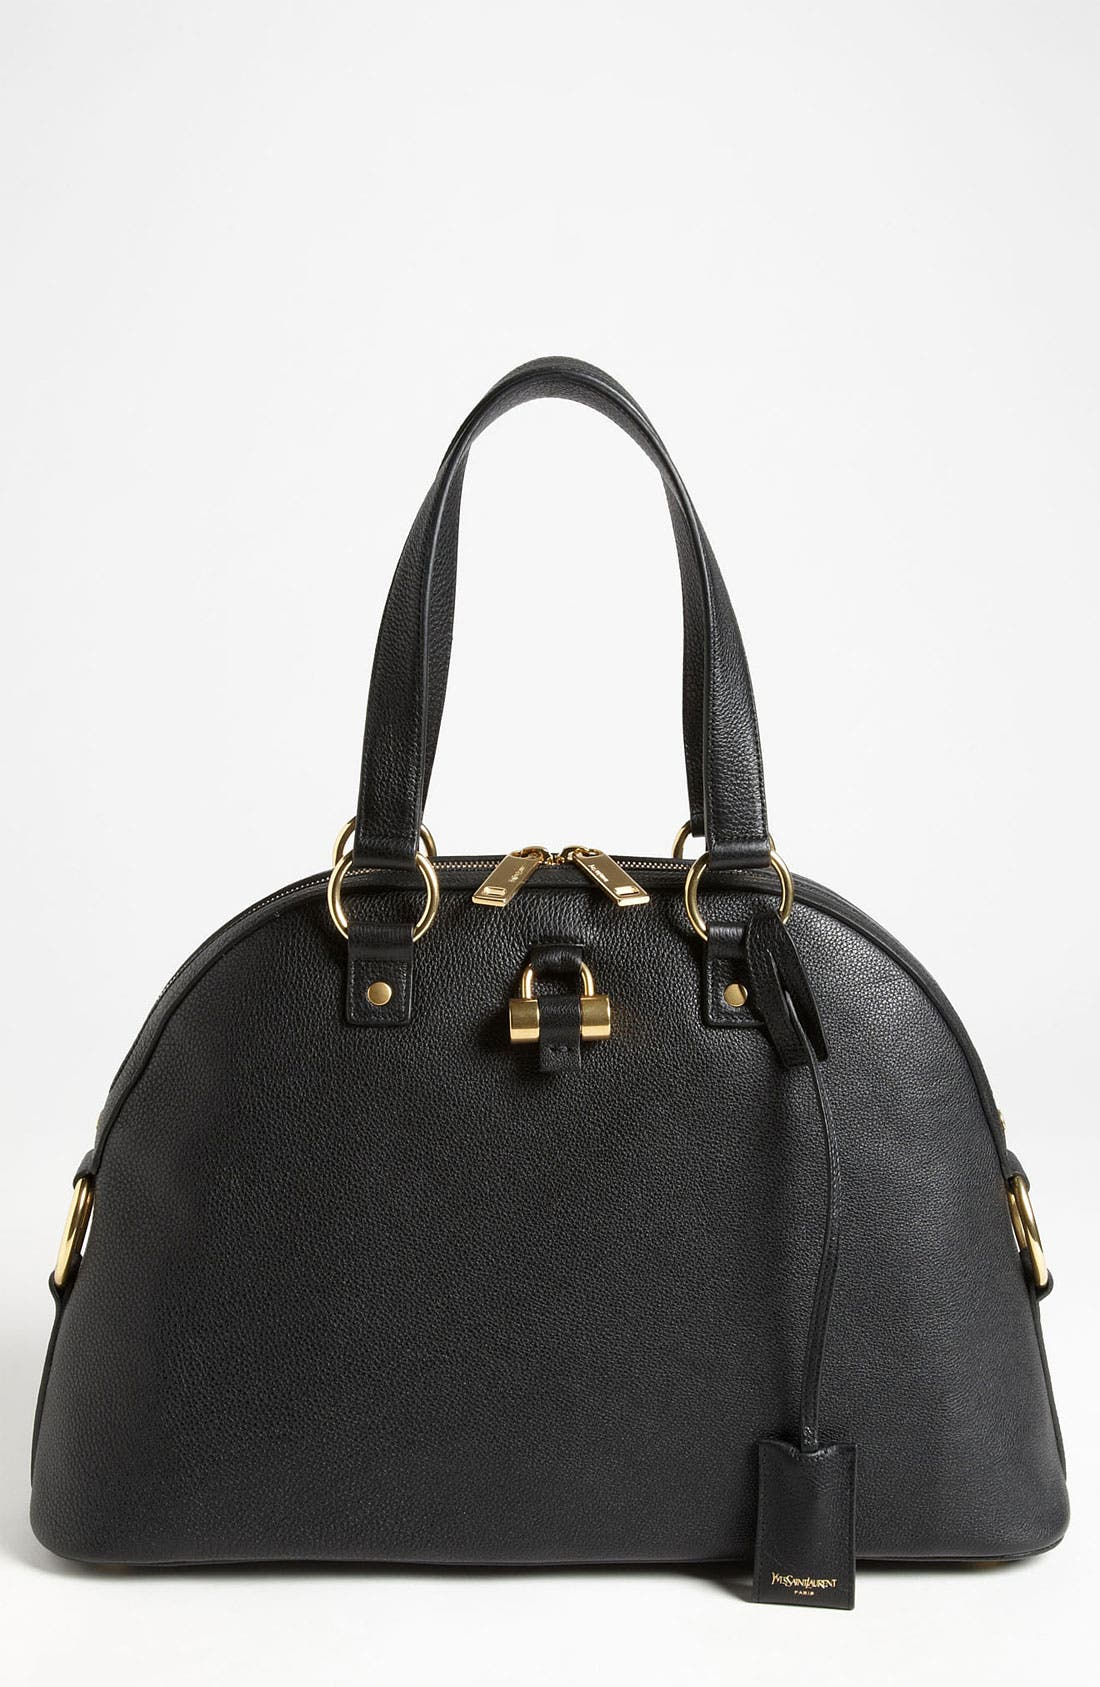 Alternate Image 1 Selected - Saint Laurent 'Muse - Medium' Leather Dome Satchel